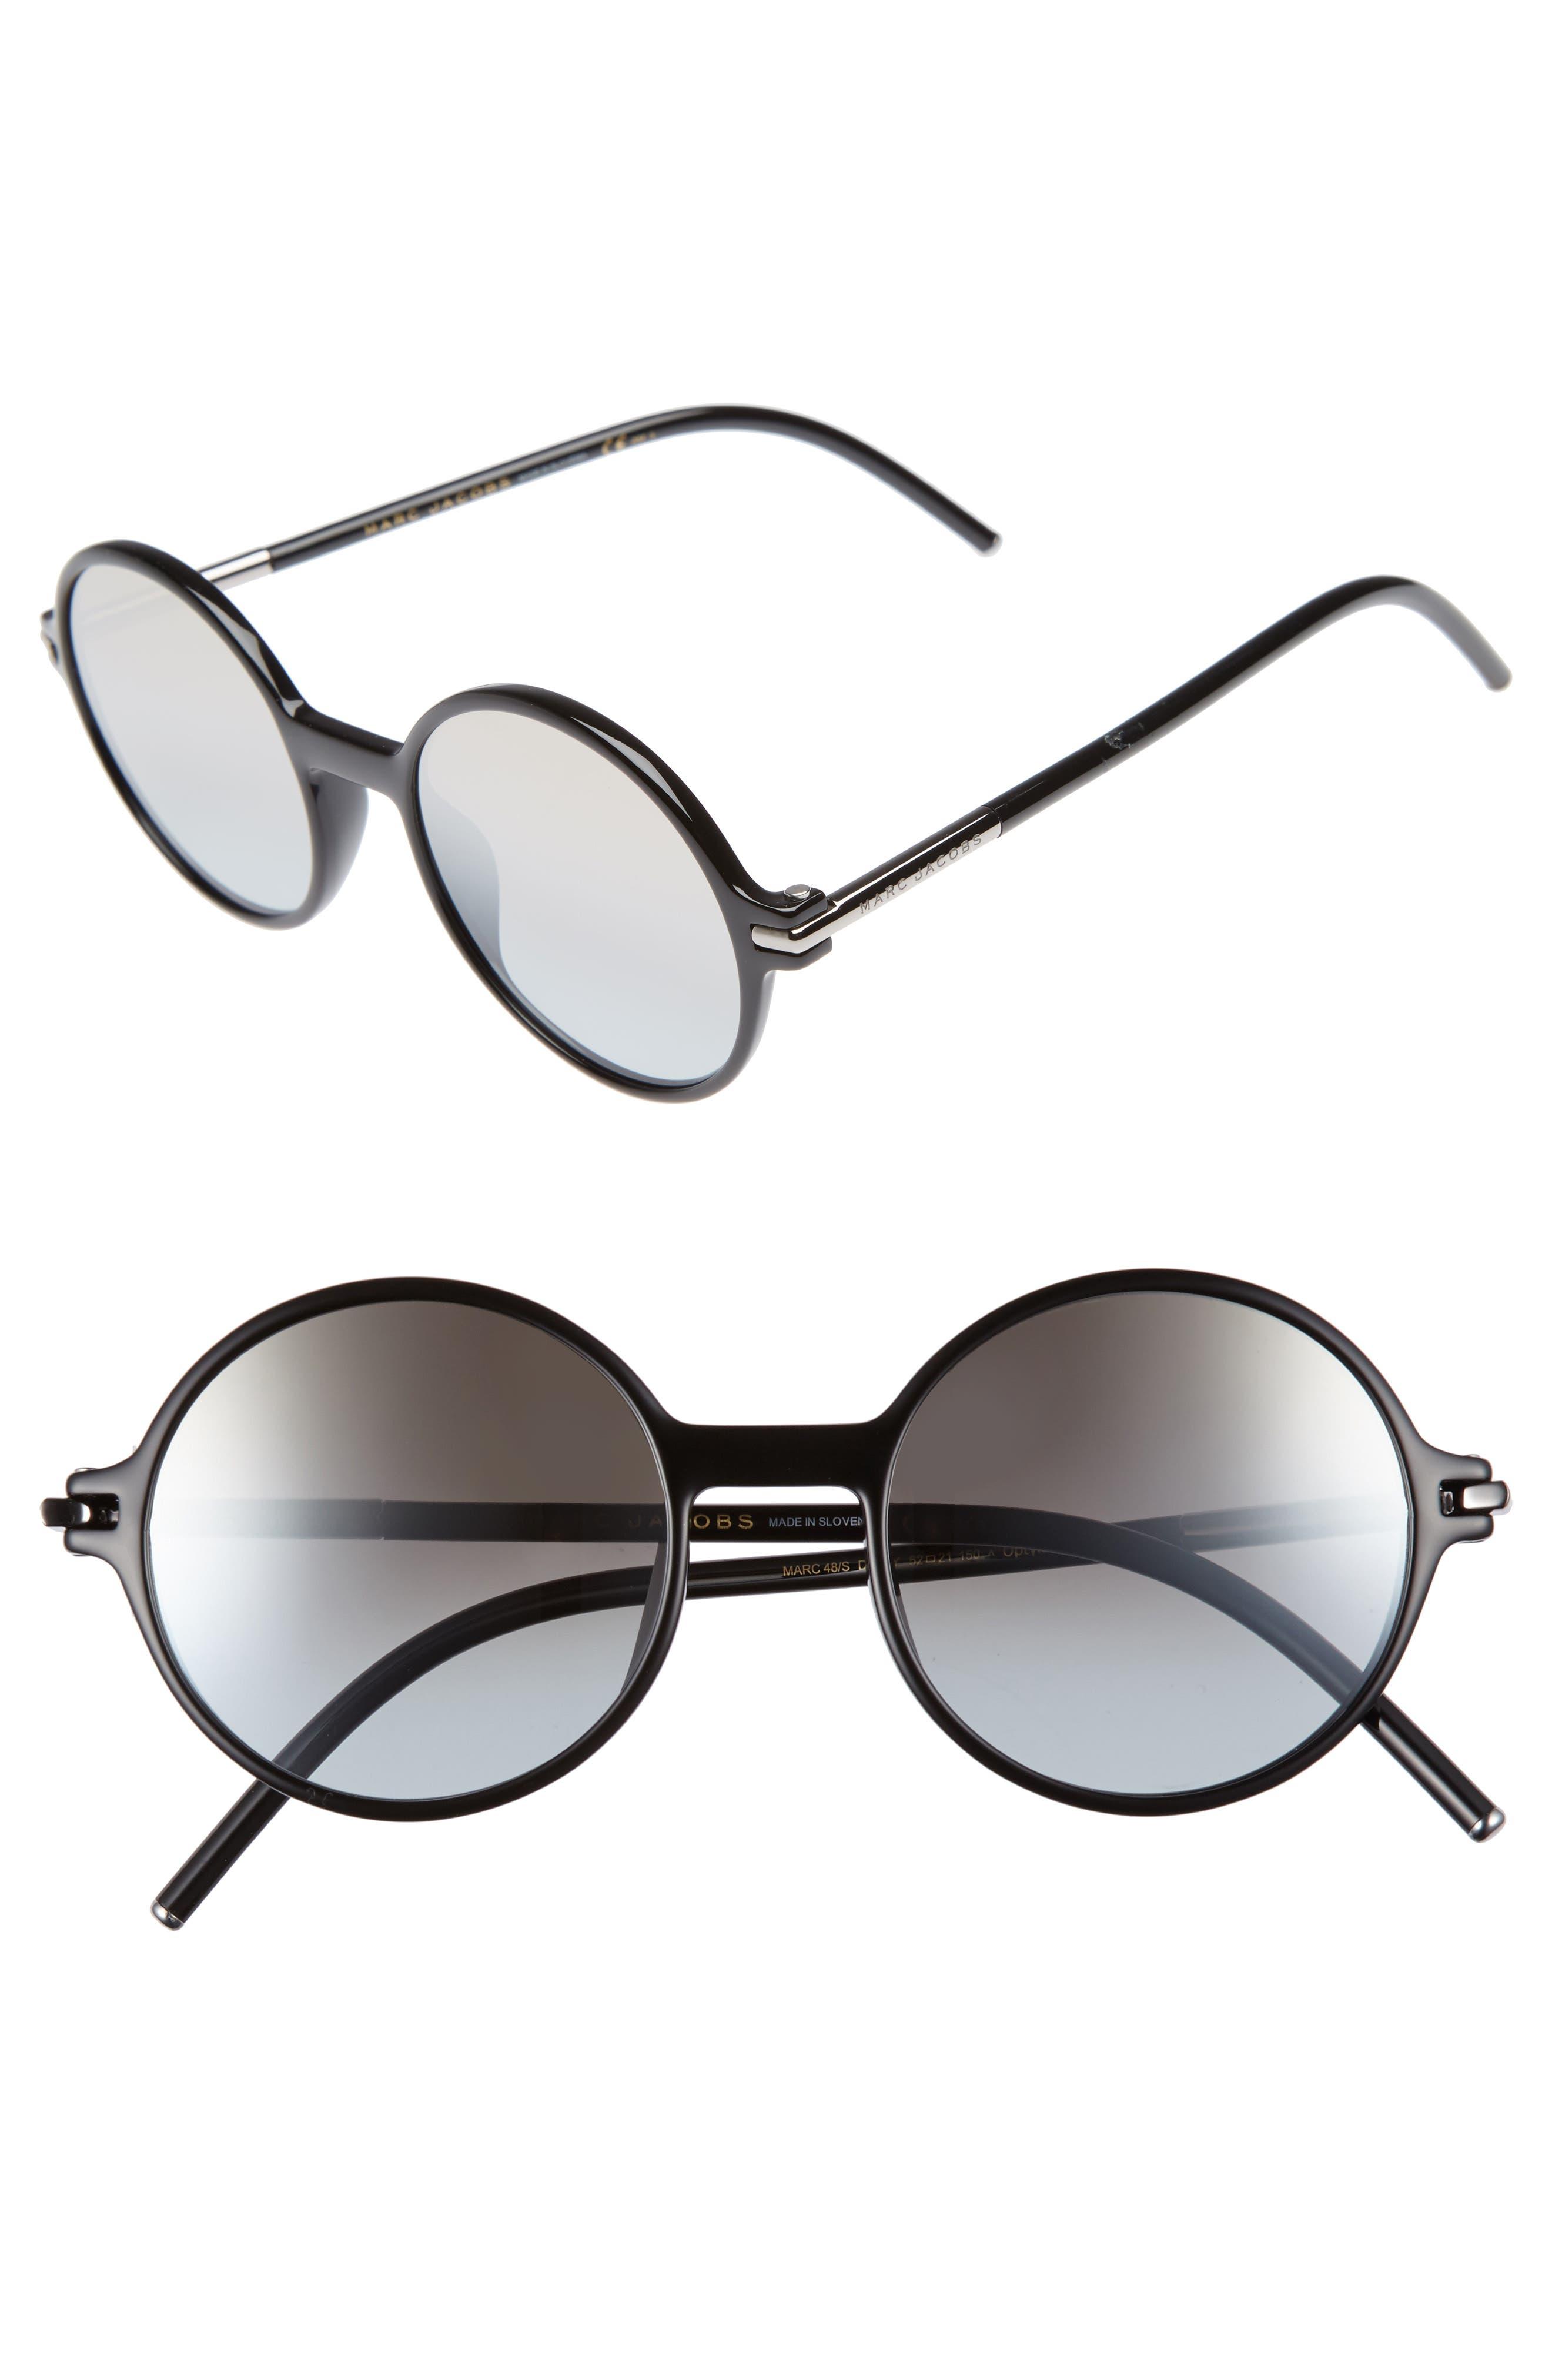 52mm Round Sunglasses,                         Main,                         color, Black/ Brown/ Gold Mirror